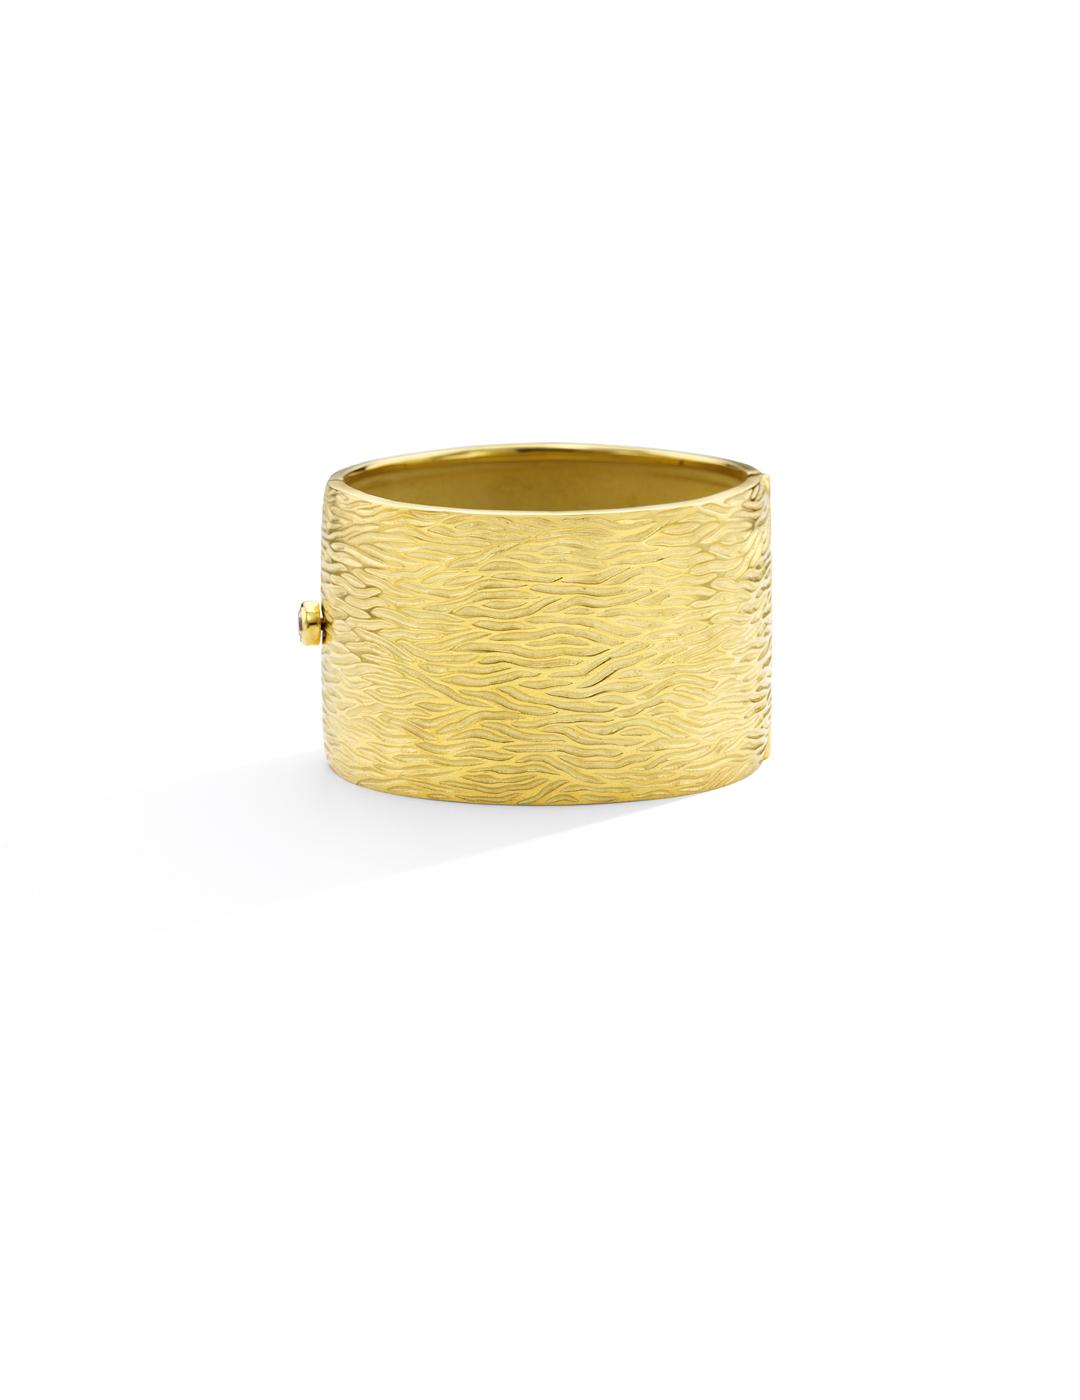 mish_jewelry_product_Bark-Cuff-1